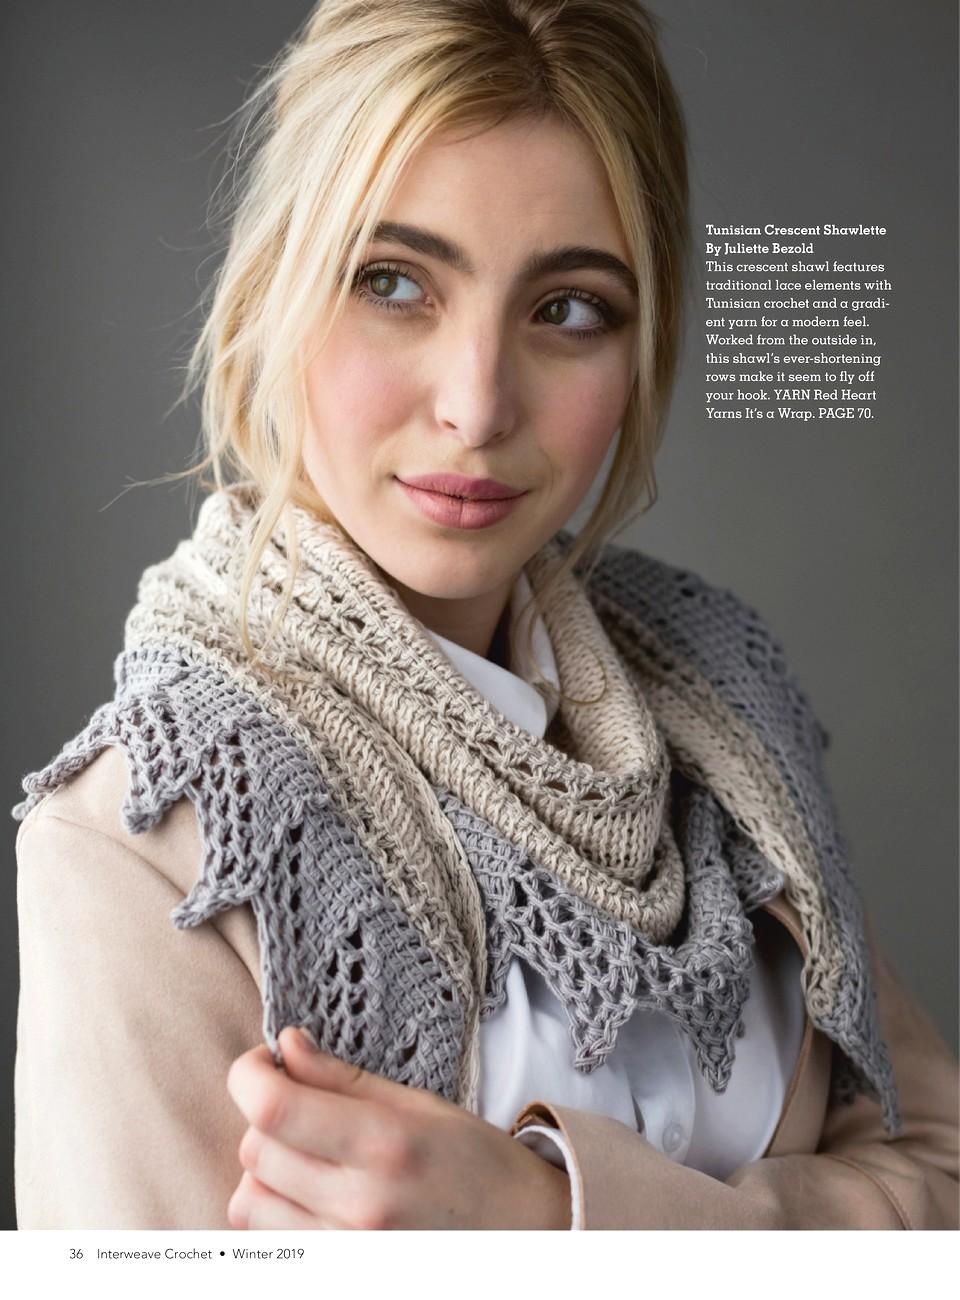 Interweave Crochet Winter 2019-37